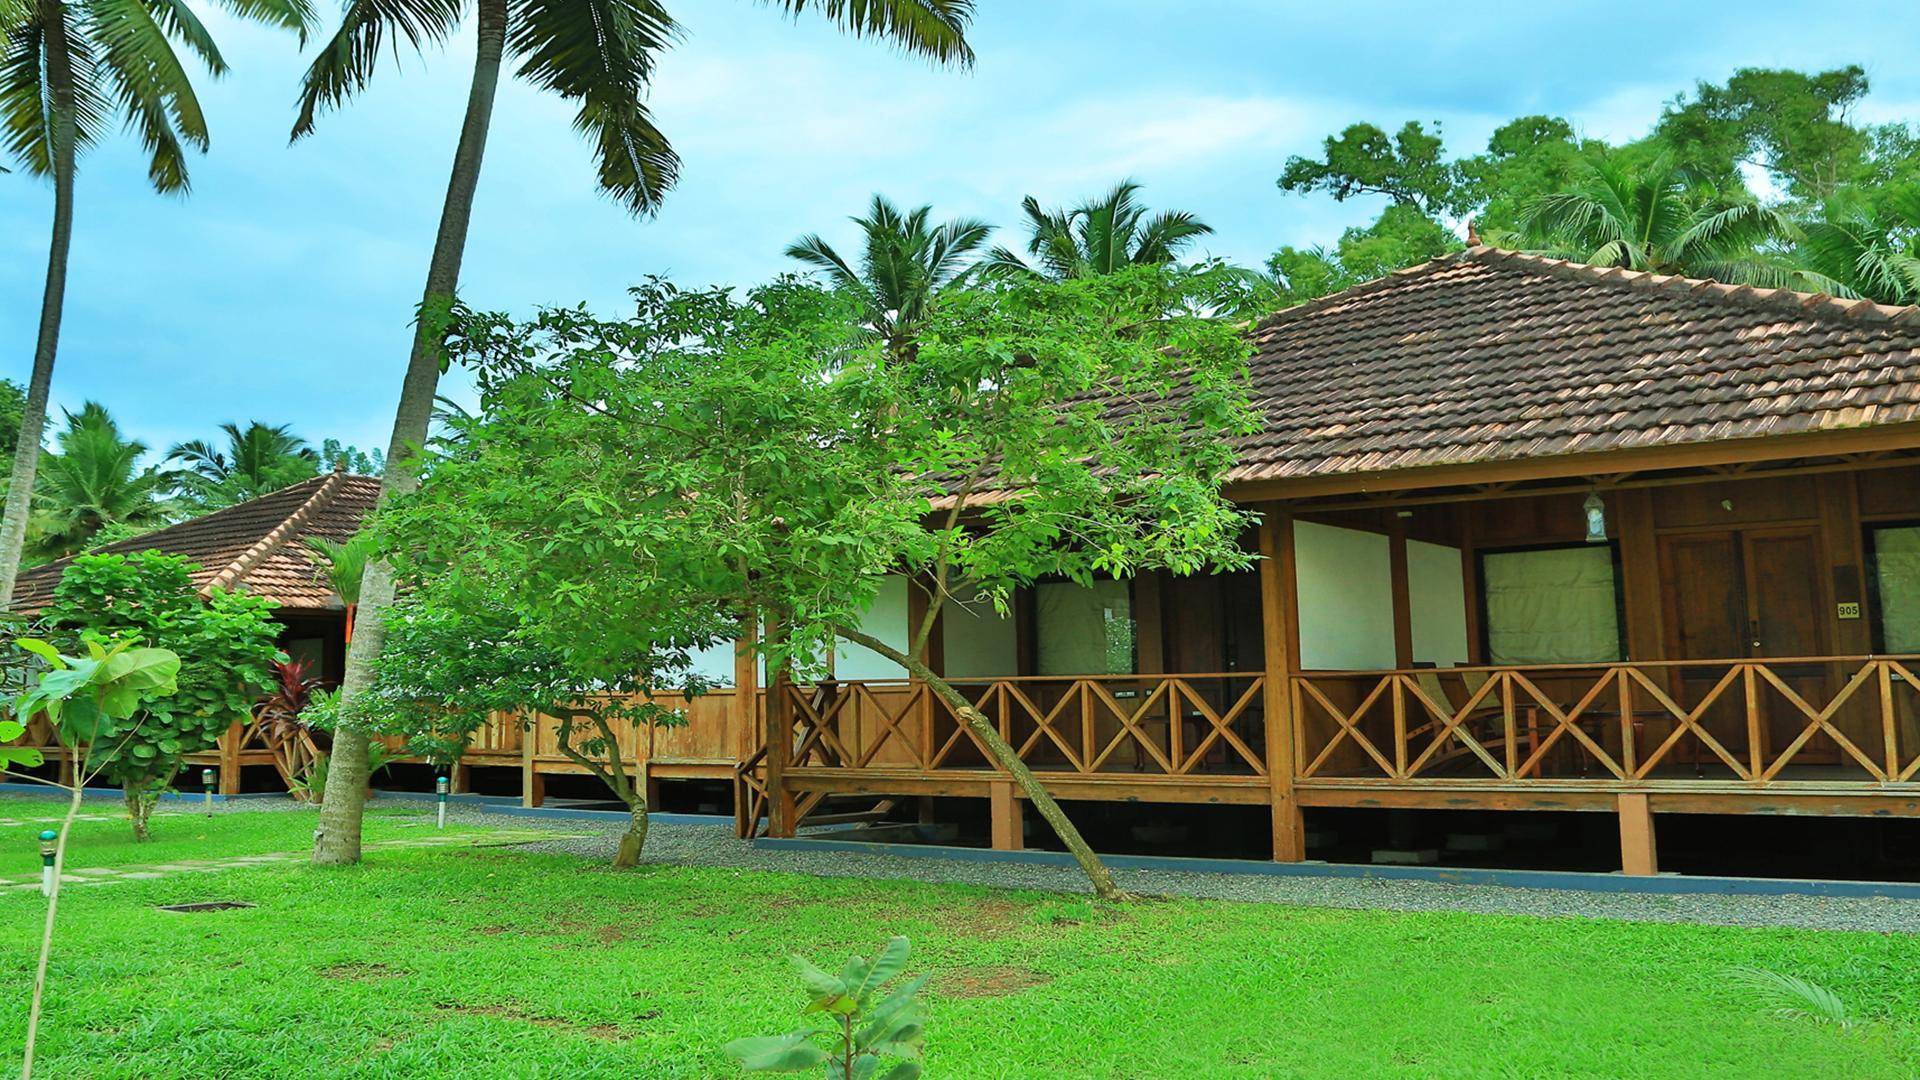 Pool Villa image 1 at Estuary Sarovar Portico by Thiruvananthapuram, Kerala, India